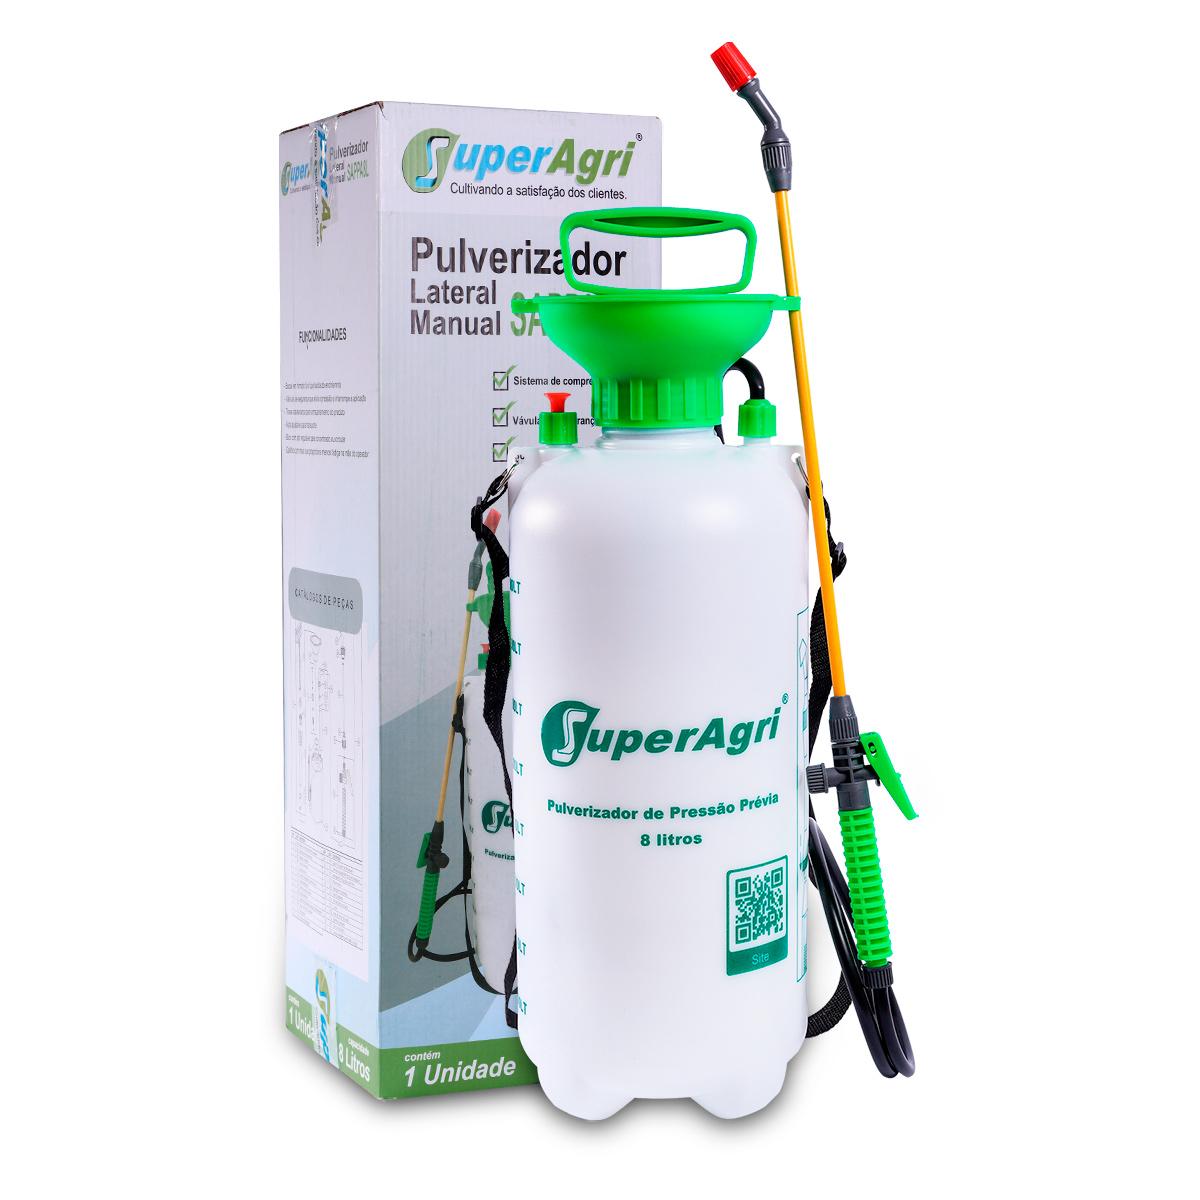 Kit Dux Defender Dul Germ H 5 Litros + Pulverizador Pressão Acumulada 8 Litros SuperAgri SAPPA8L